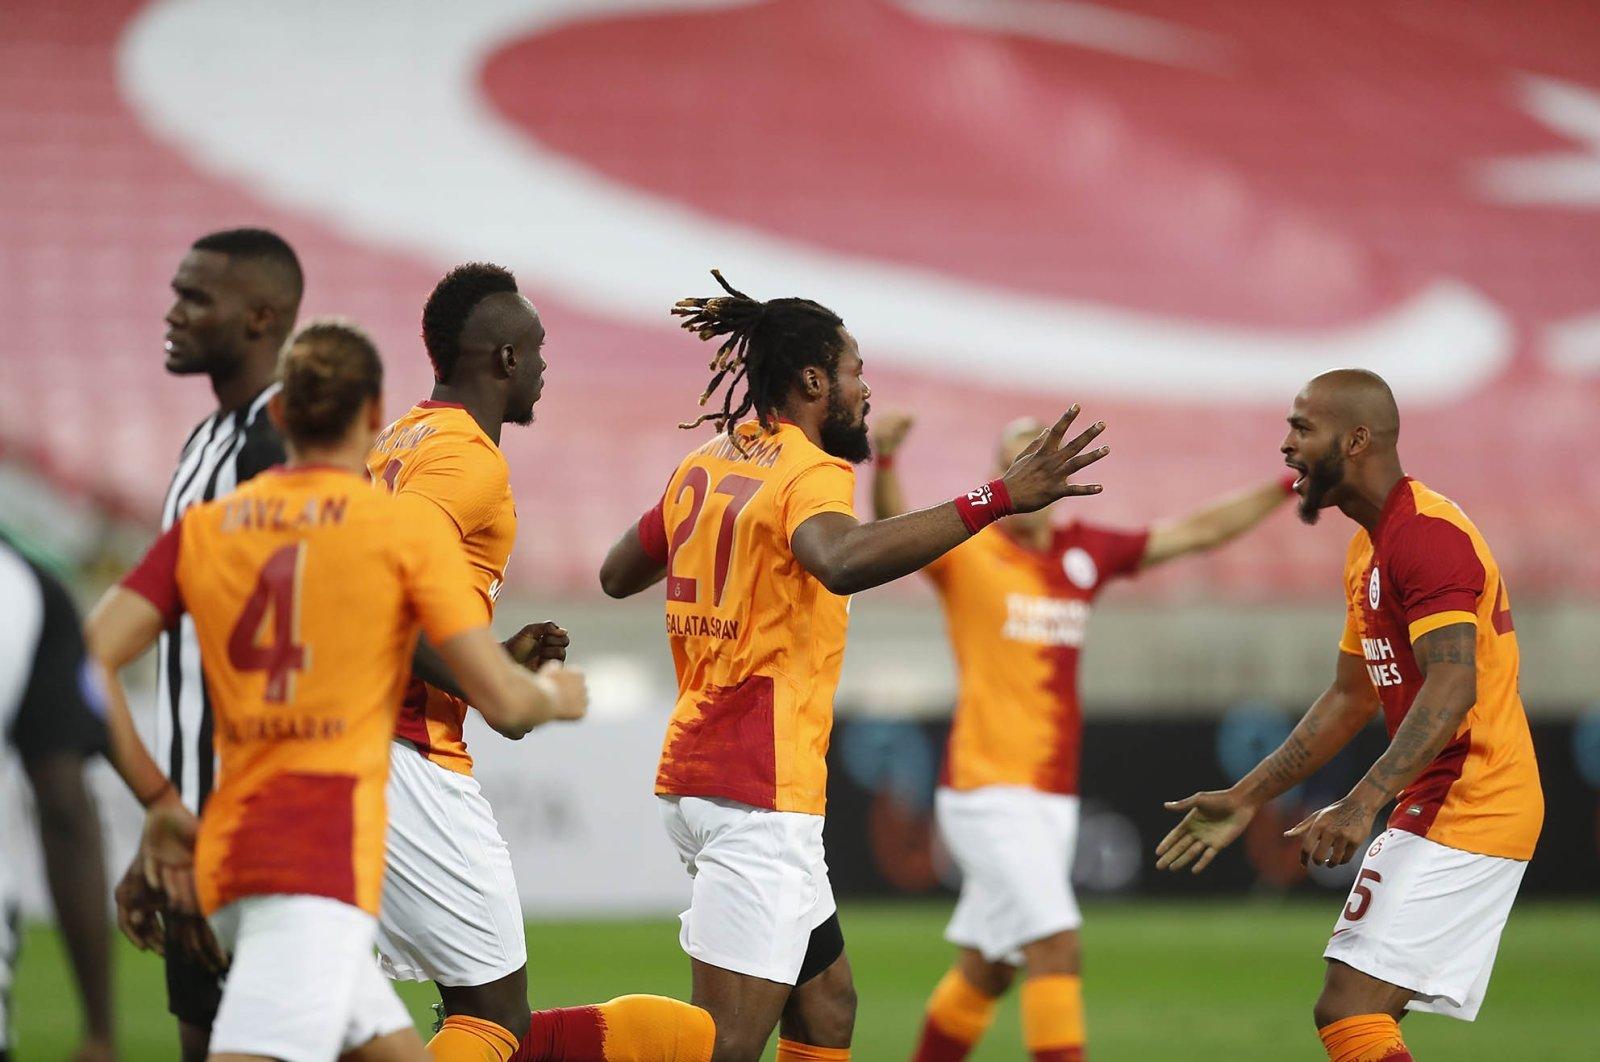 Galatasaray players celebrate a goal during a Europa League qualifier match against Neftçi in Baku, Azerbaijan, Sept. 17, 2020. (IHA Photo)